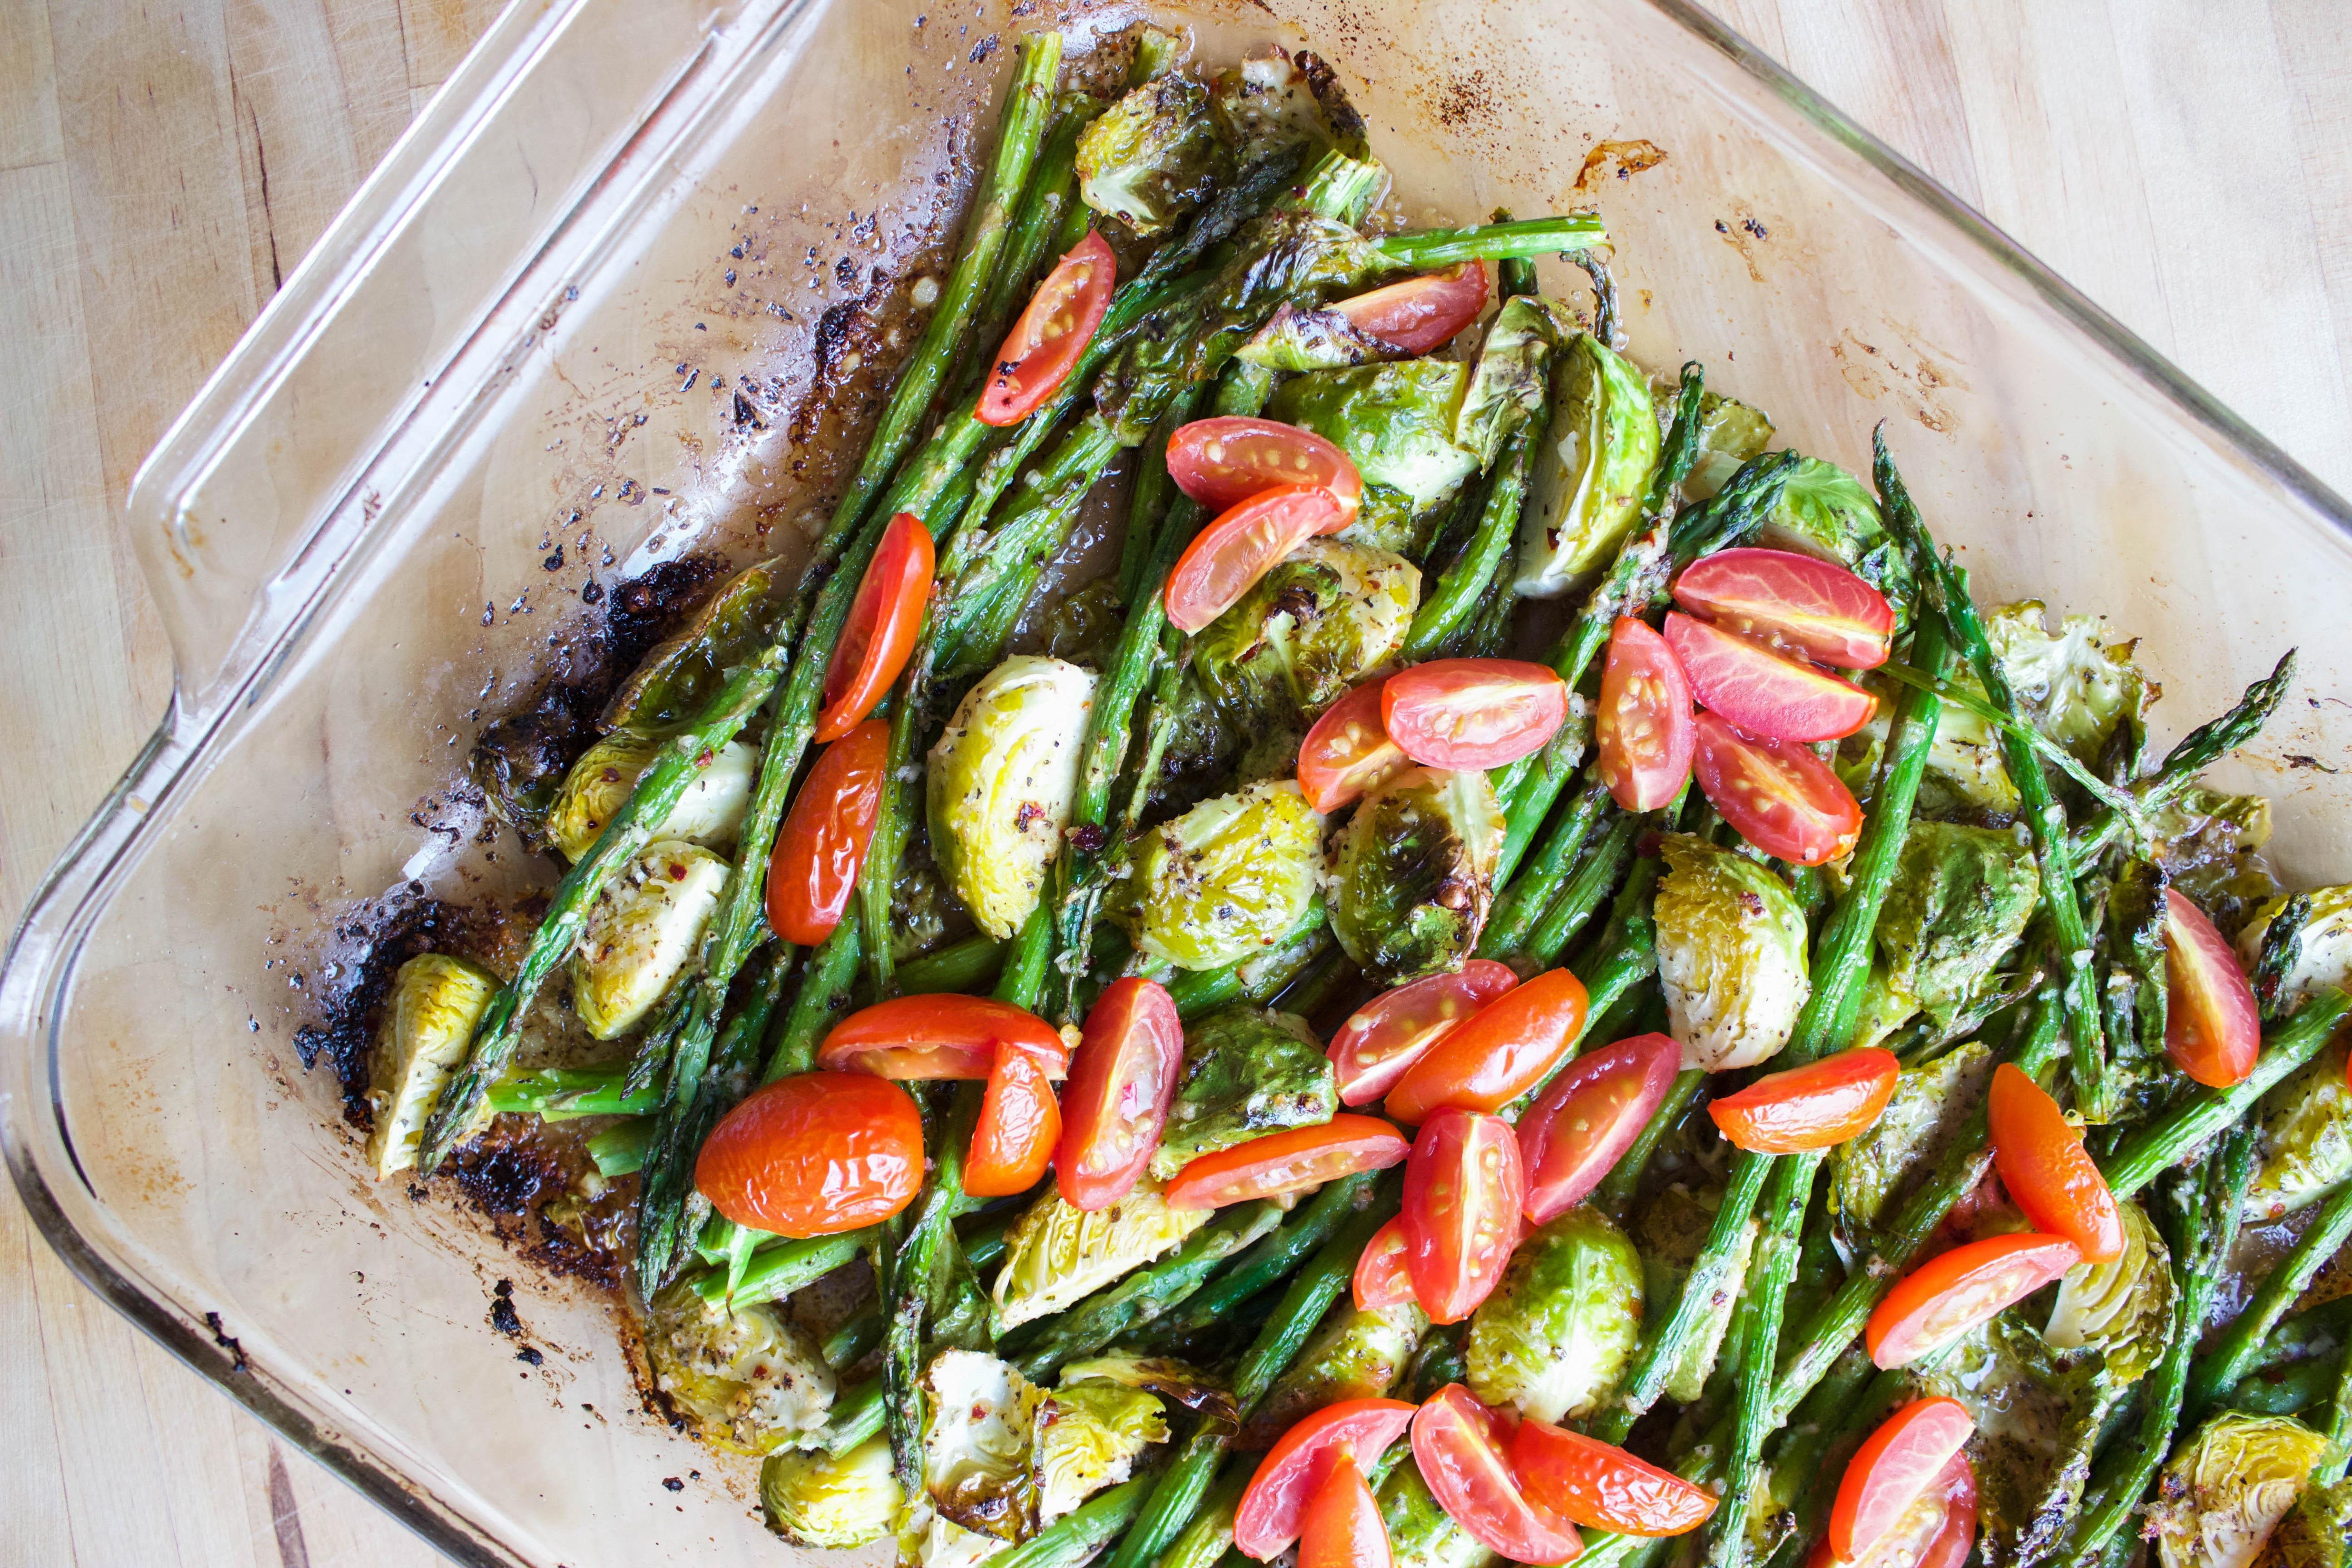 Healthy Roasted Vegetables  Garlic & Lemon Roasted Ve ables